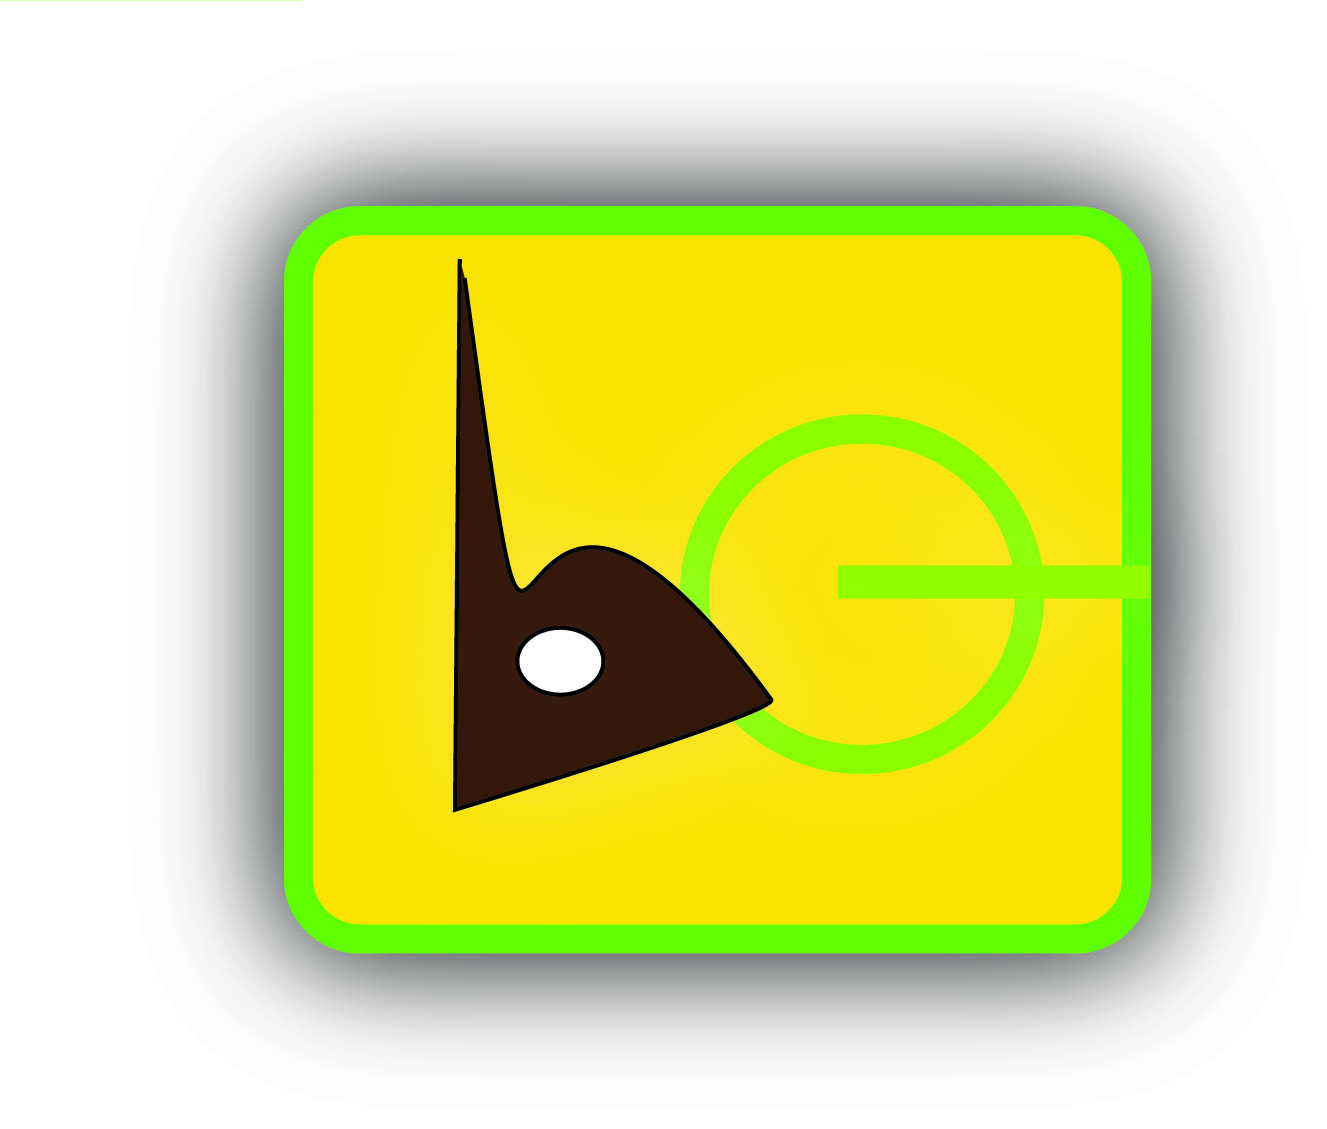 Logo Design by Safal Adam - Entry No. 239 in the Logo Design Contest New Logo Design for Brown Code.